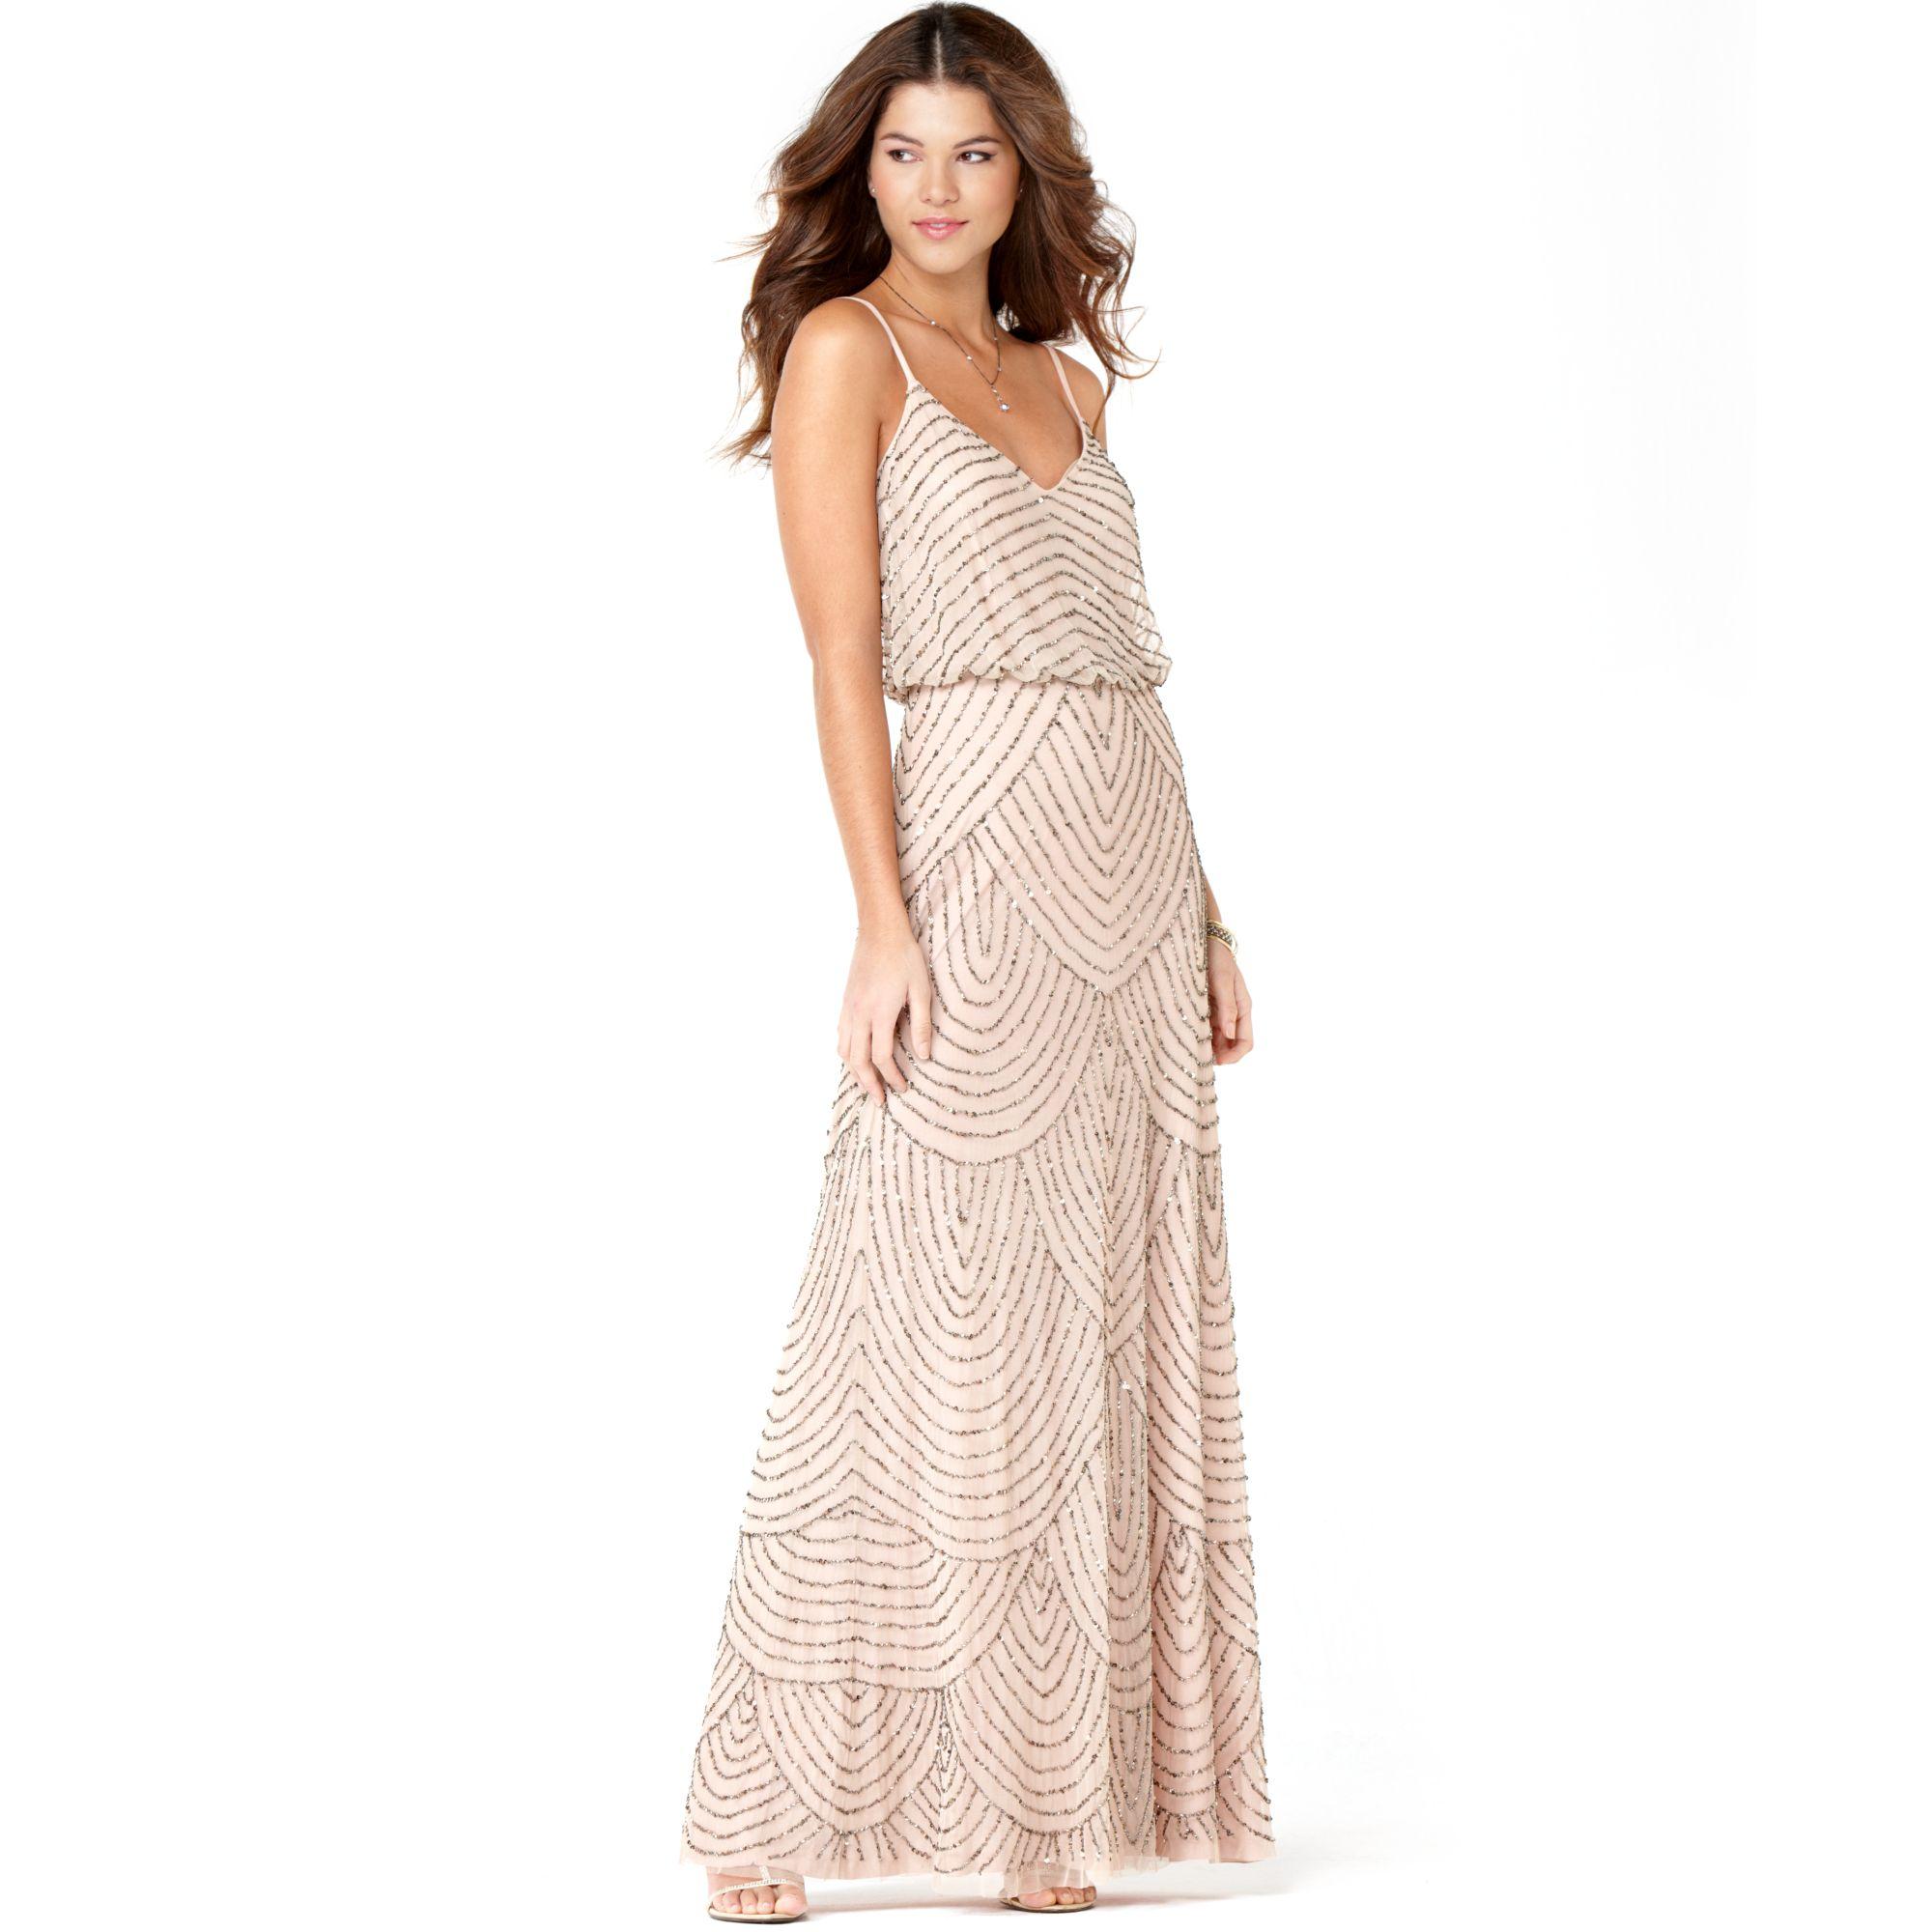 Adrianna Papell Prom Dresses